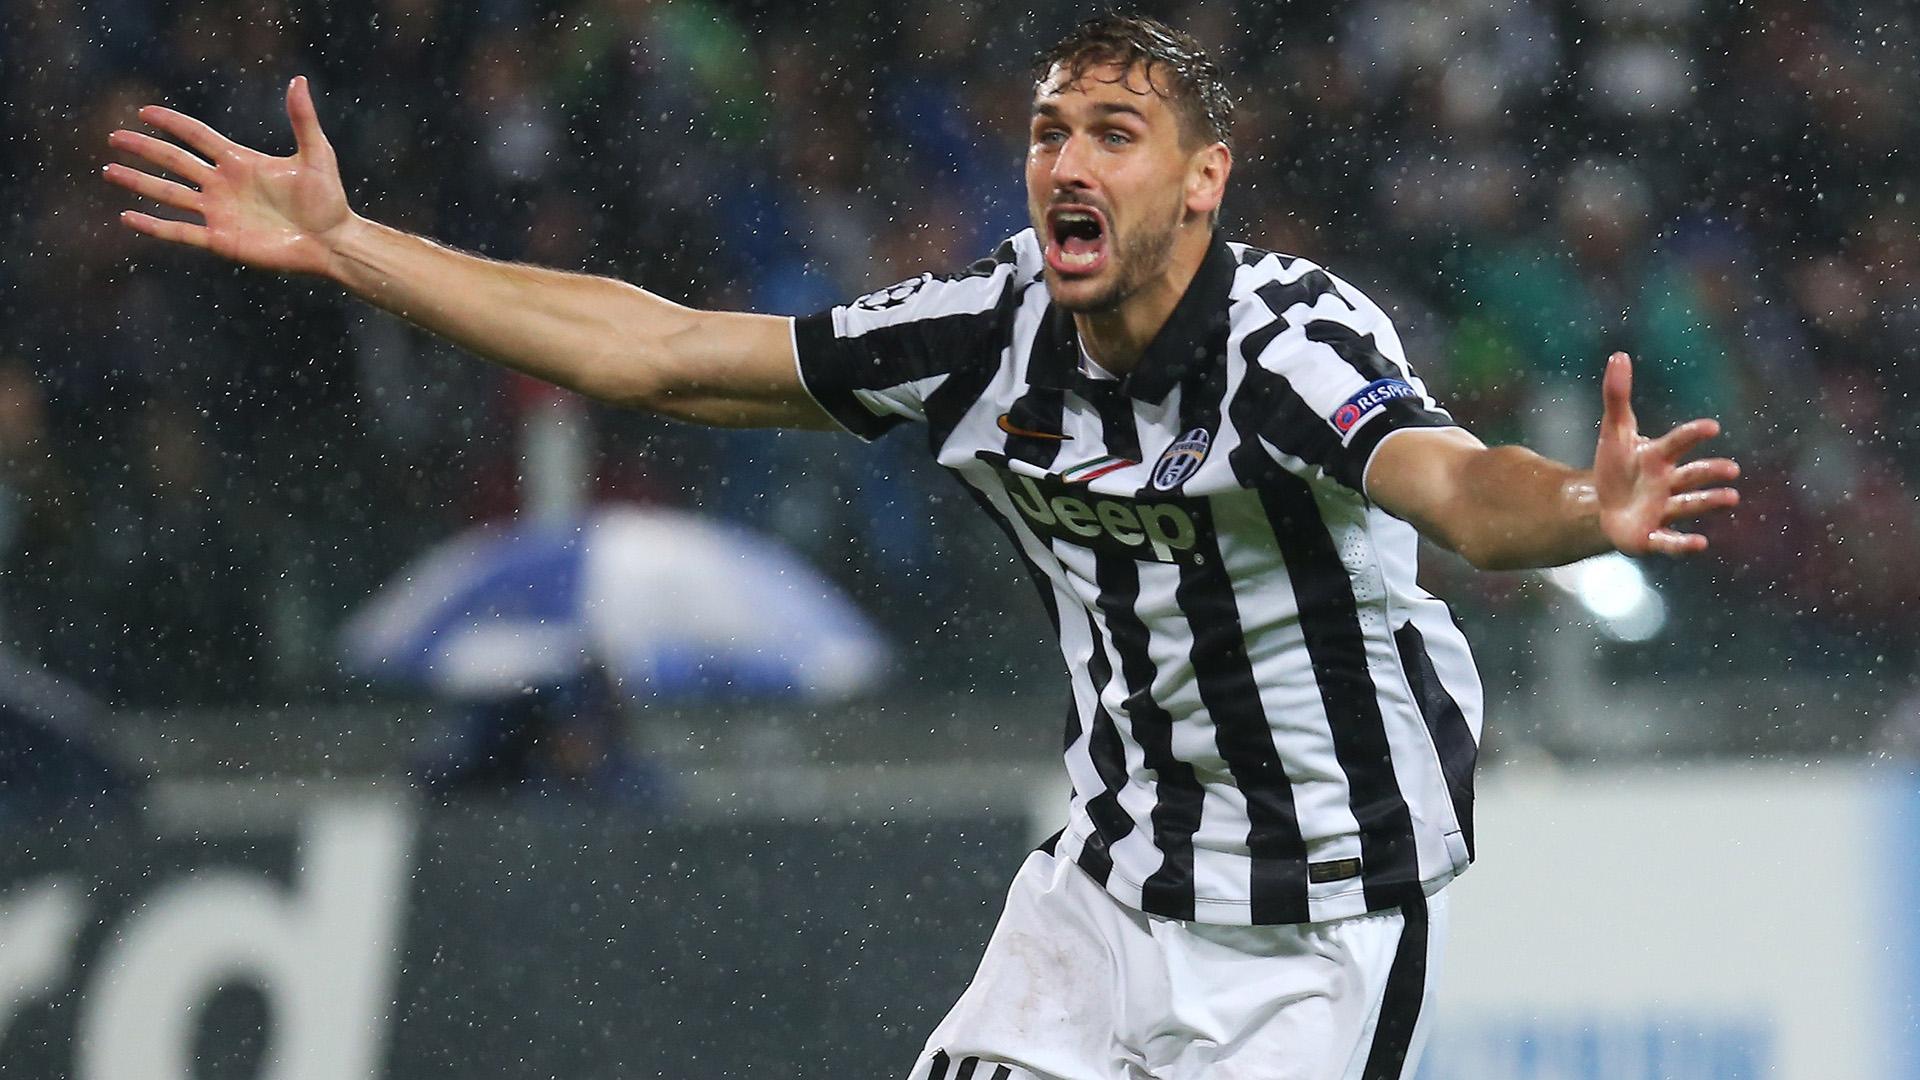 fernando-llorente-juventus-olympiacos-champions-league    Fernando Llorente Juventus Goal